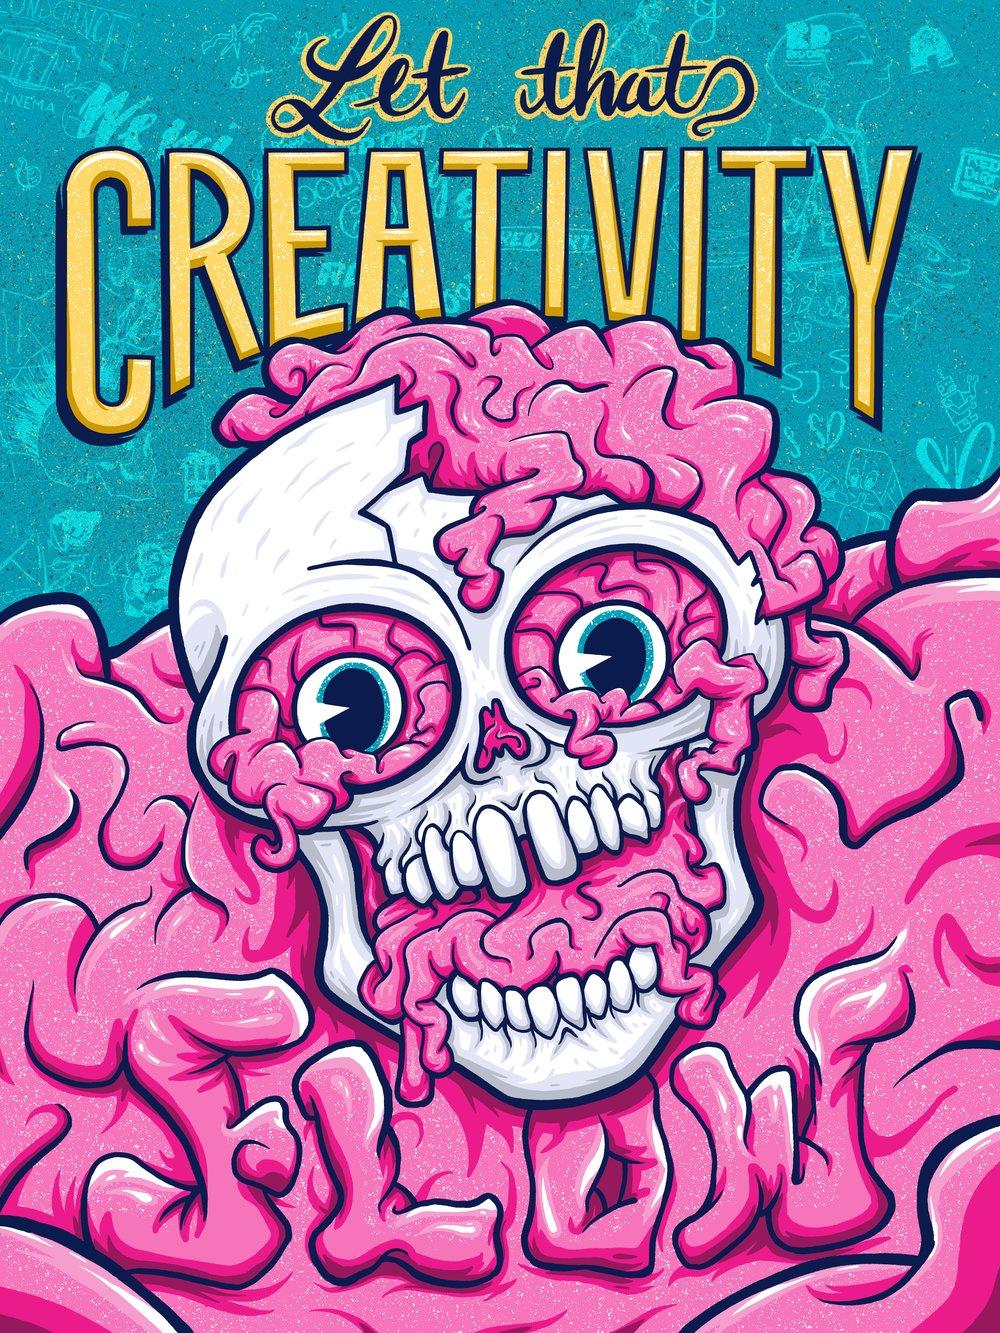 CreativityFlow